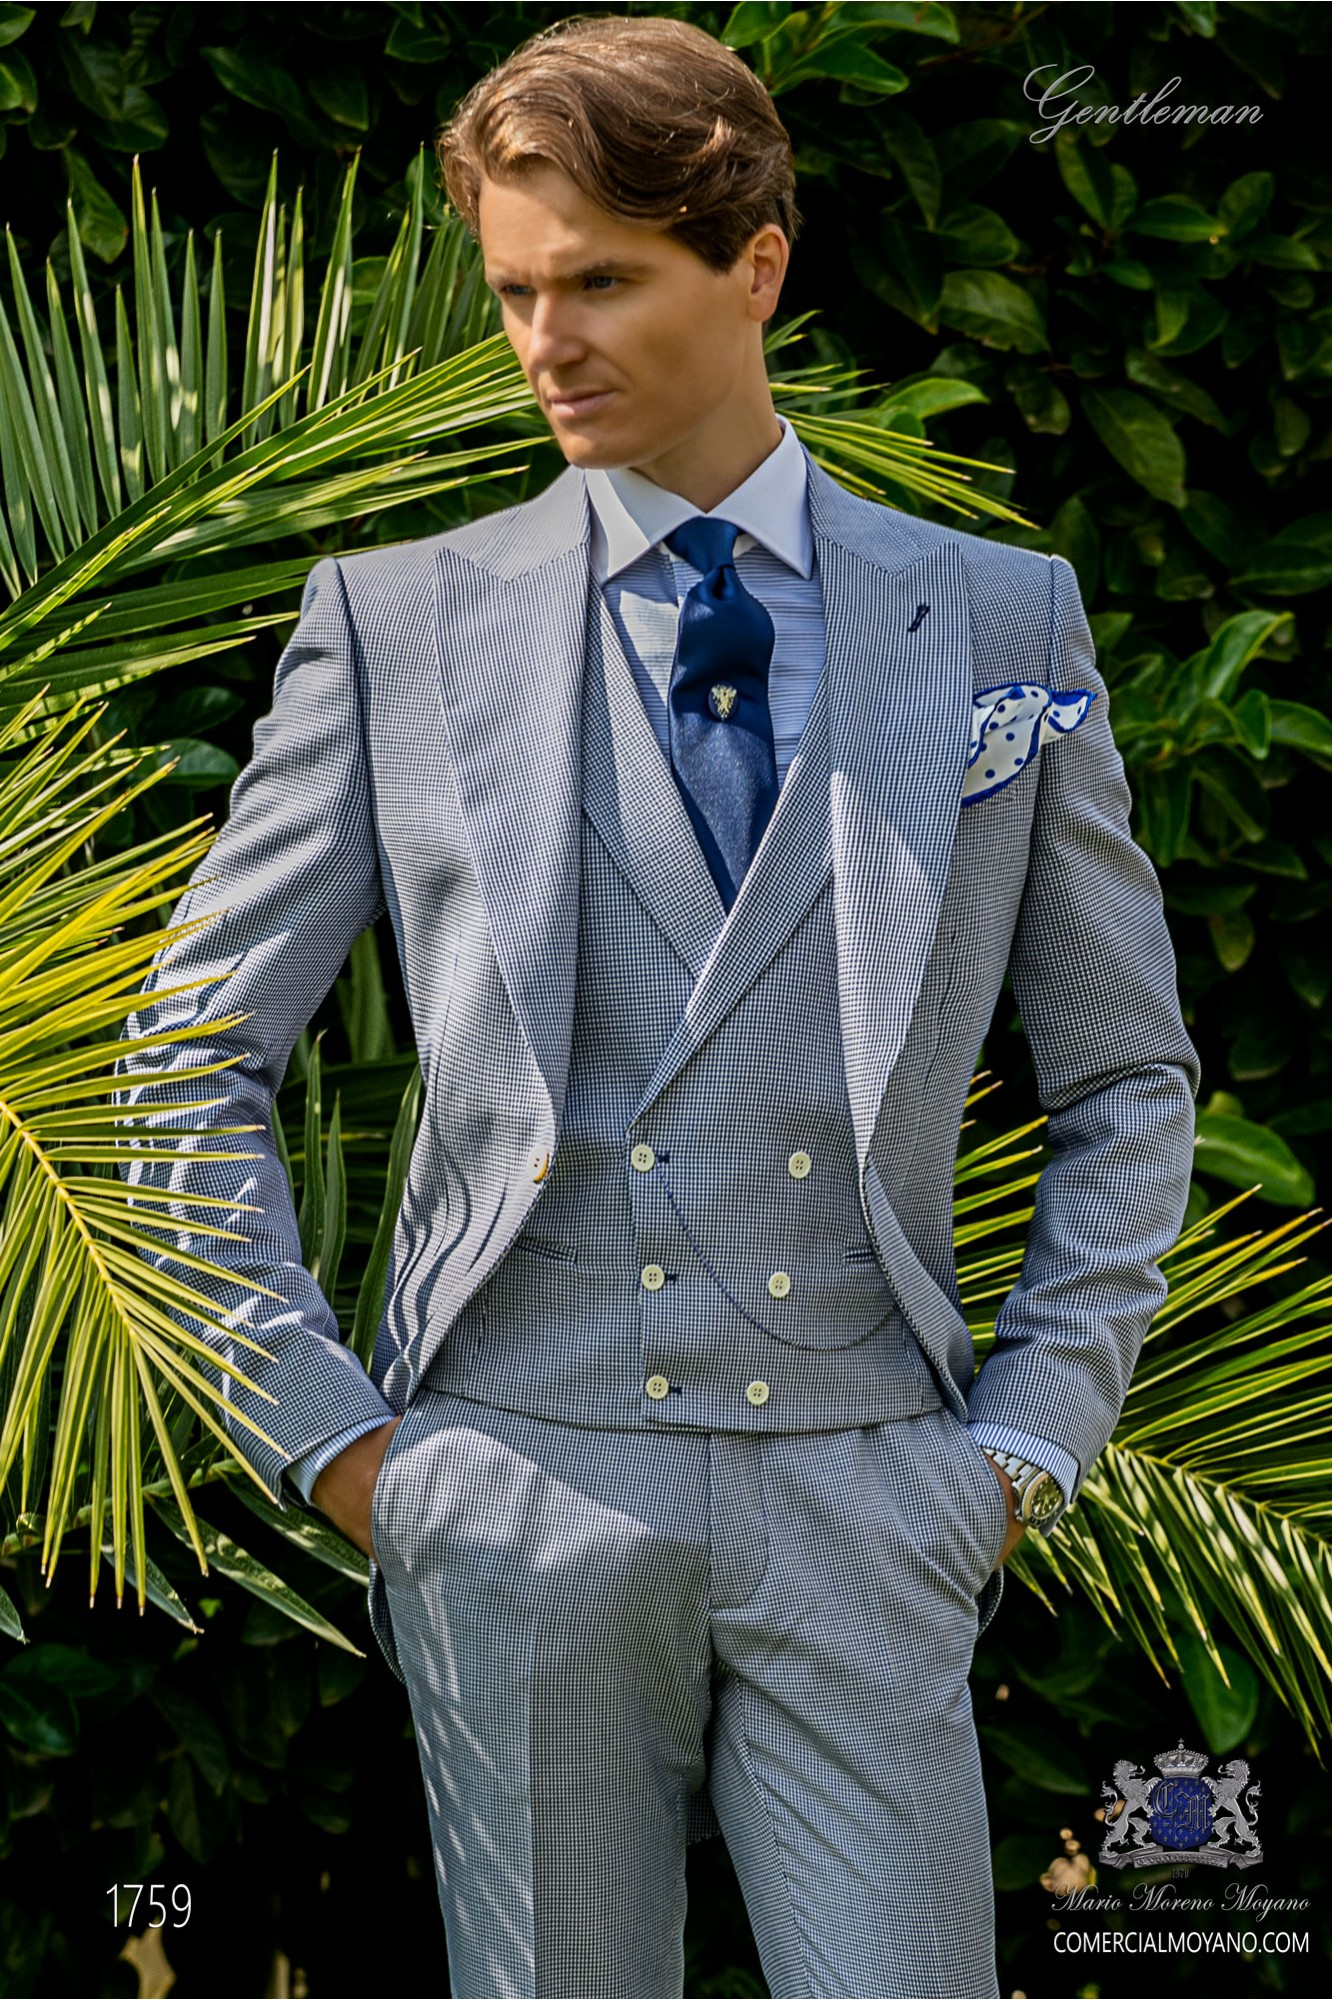 Bespoke Houndstooth morning suit royal blue model 1759 Ottavio Nuccio Gala